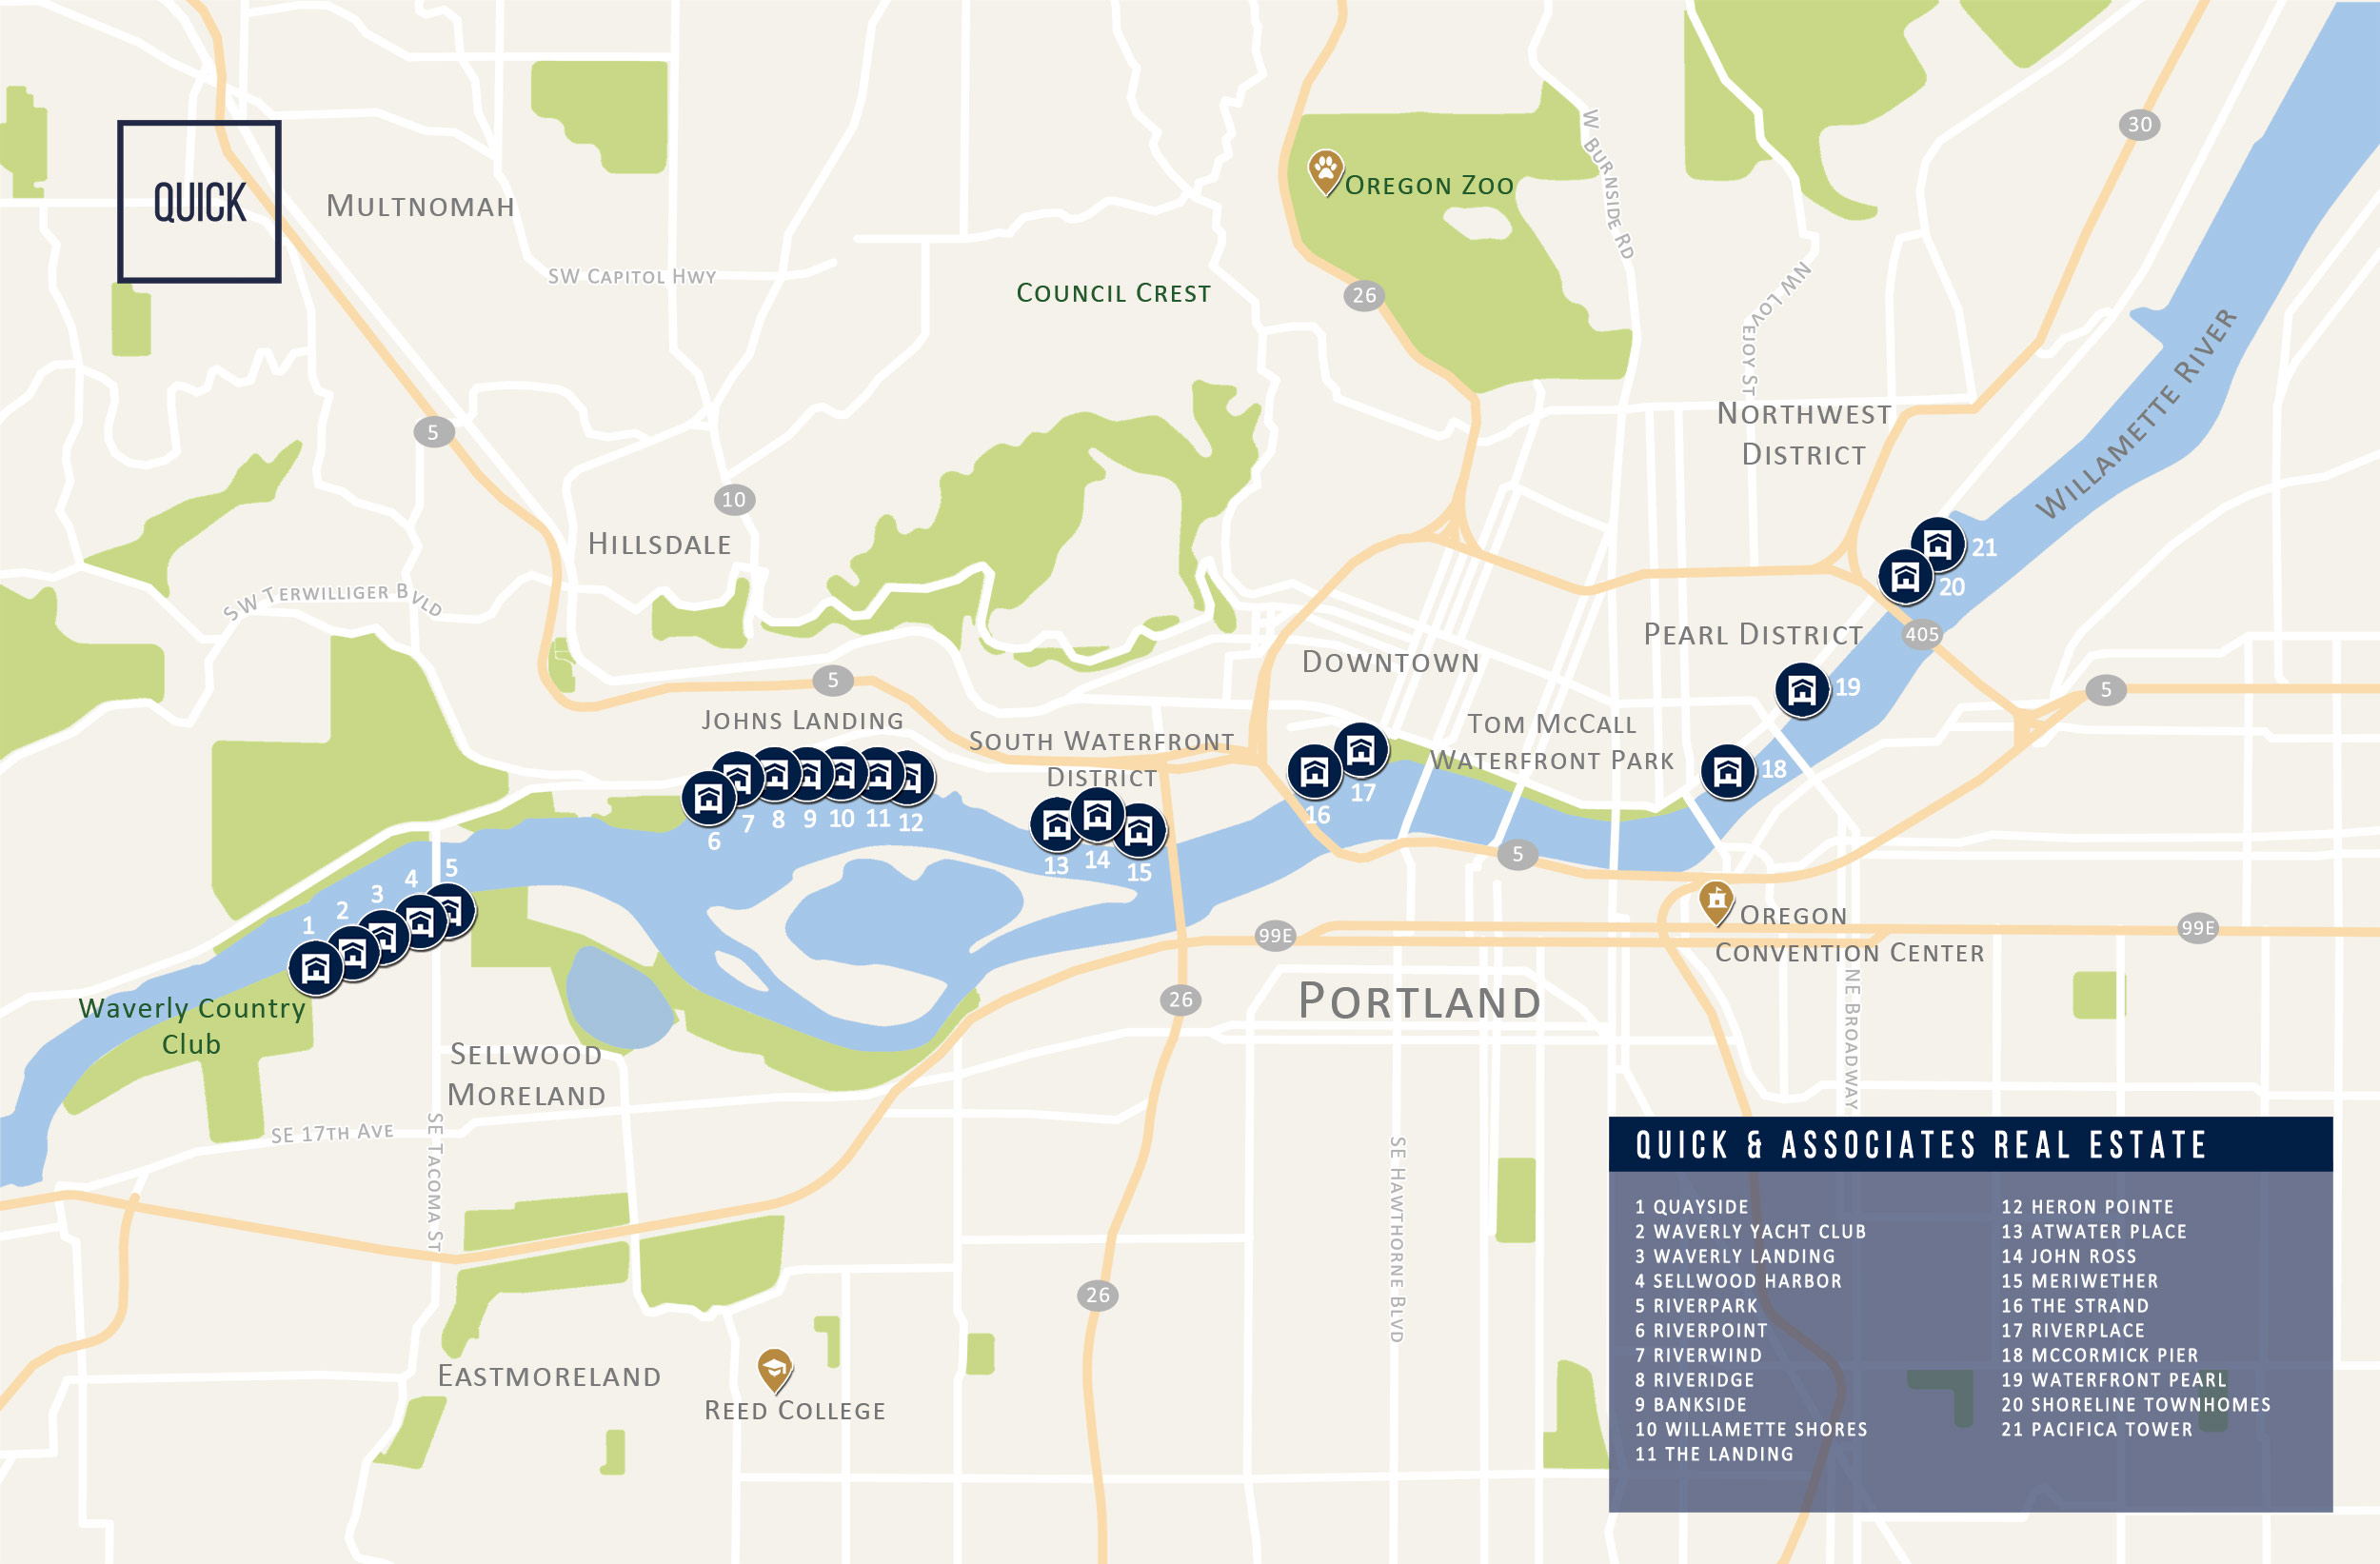 Report sample: Portland Waterfront Condo map